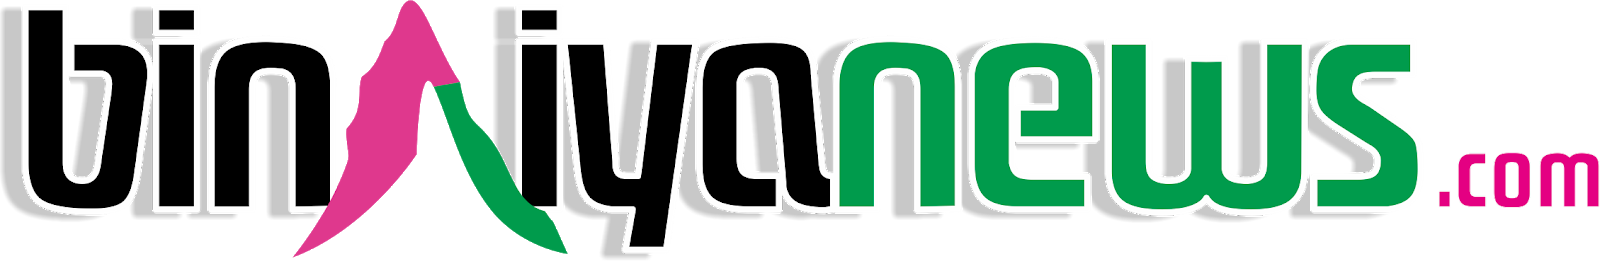 Binaiyanews.com